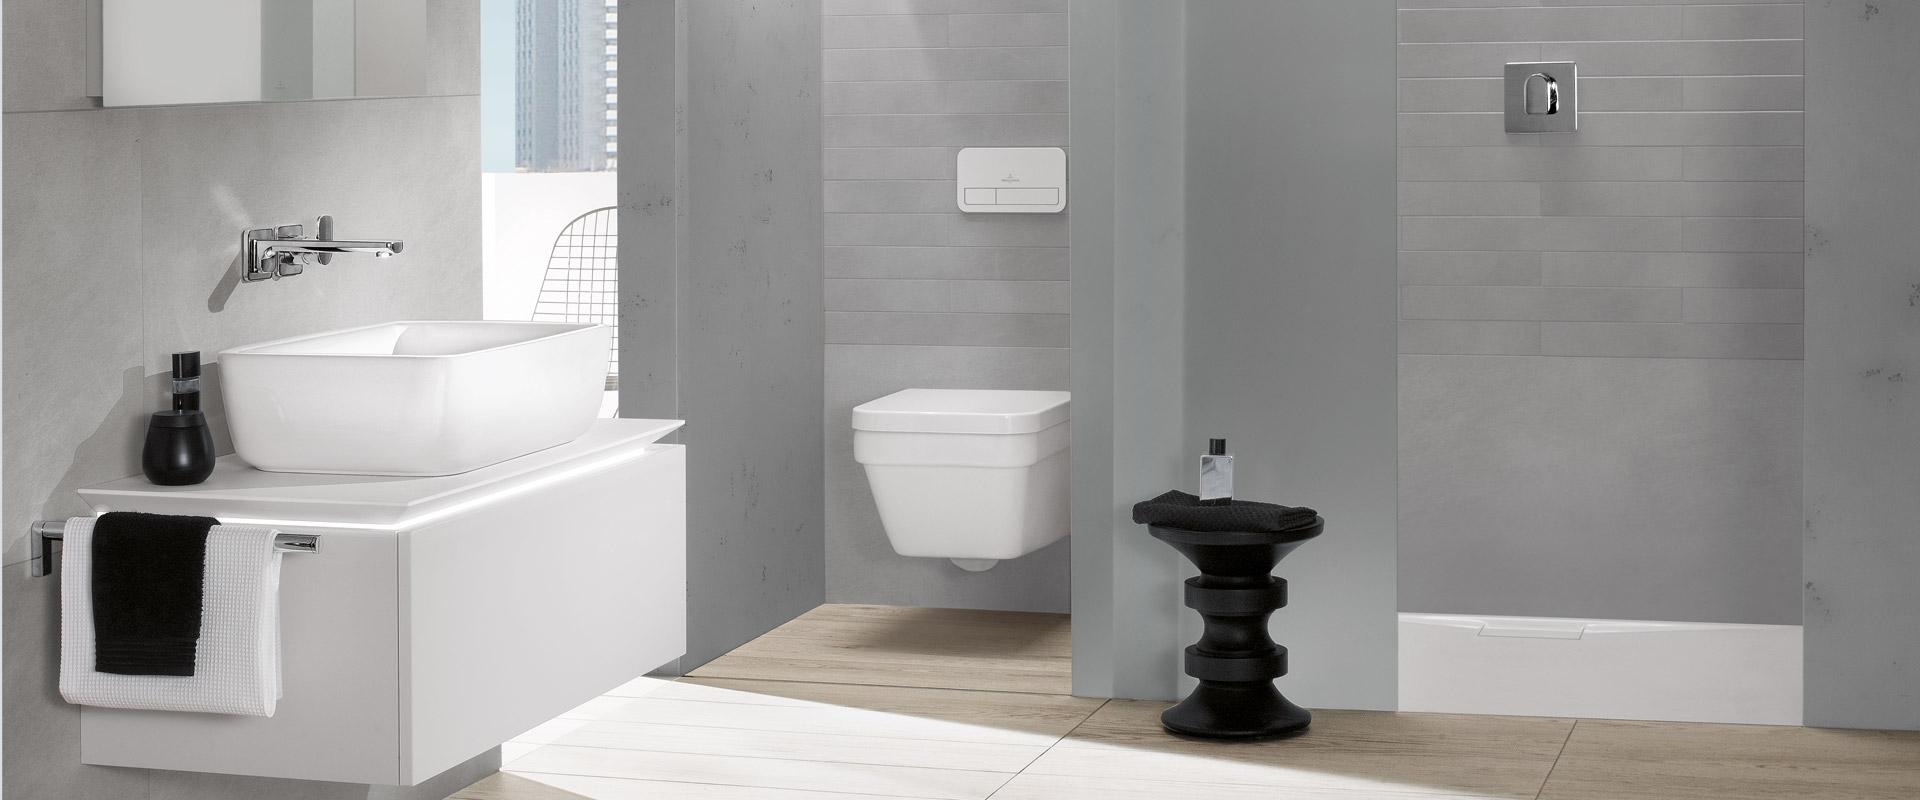 Collection architectura un design atemporel villeroy boch - Villeroy et boch salle de bains ...